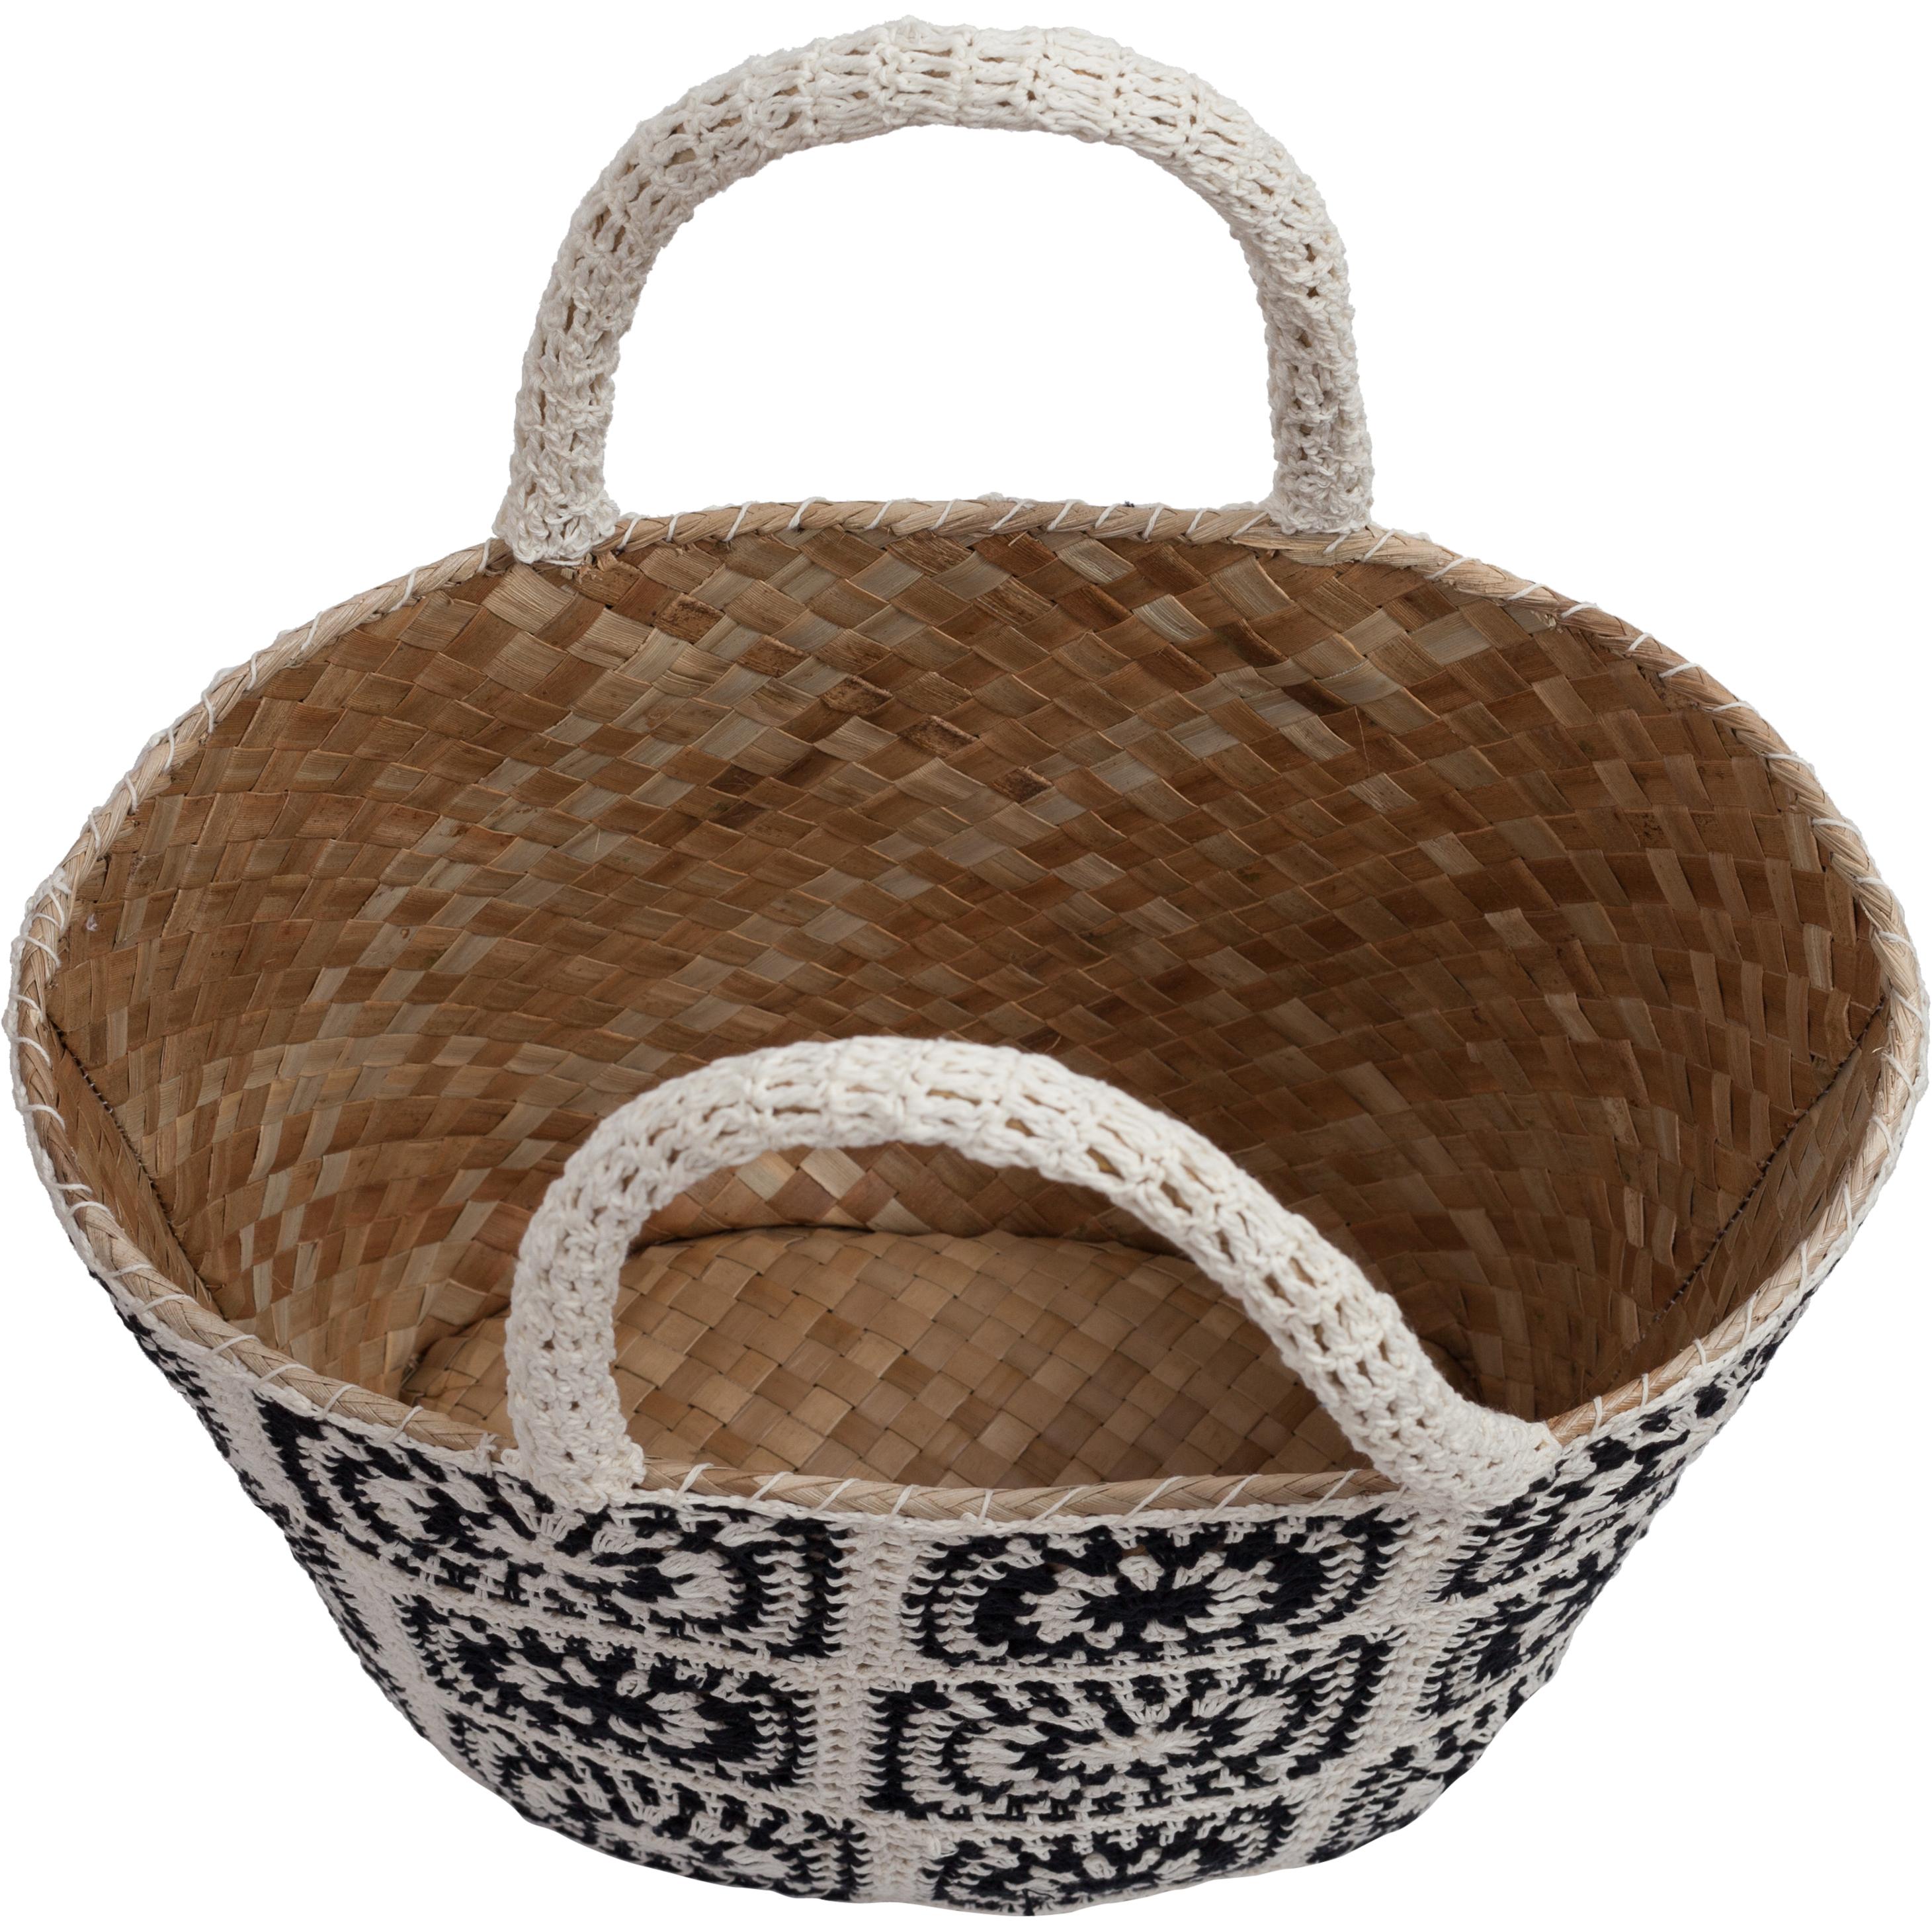 panier balinais en paille crochet noir blanc panier coachella black white. Black Bedroom Furniture Sets. Home Design Ideas